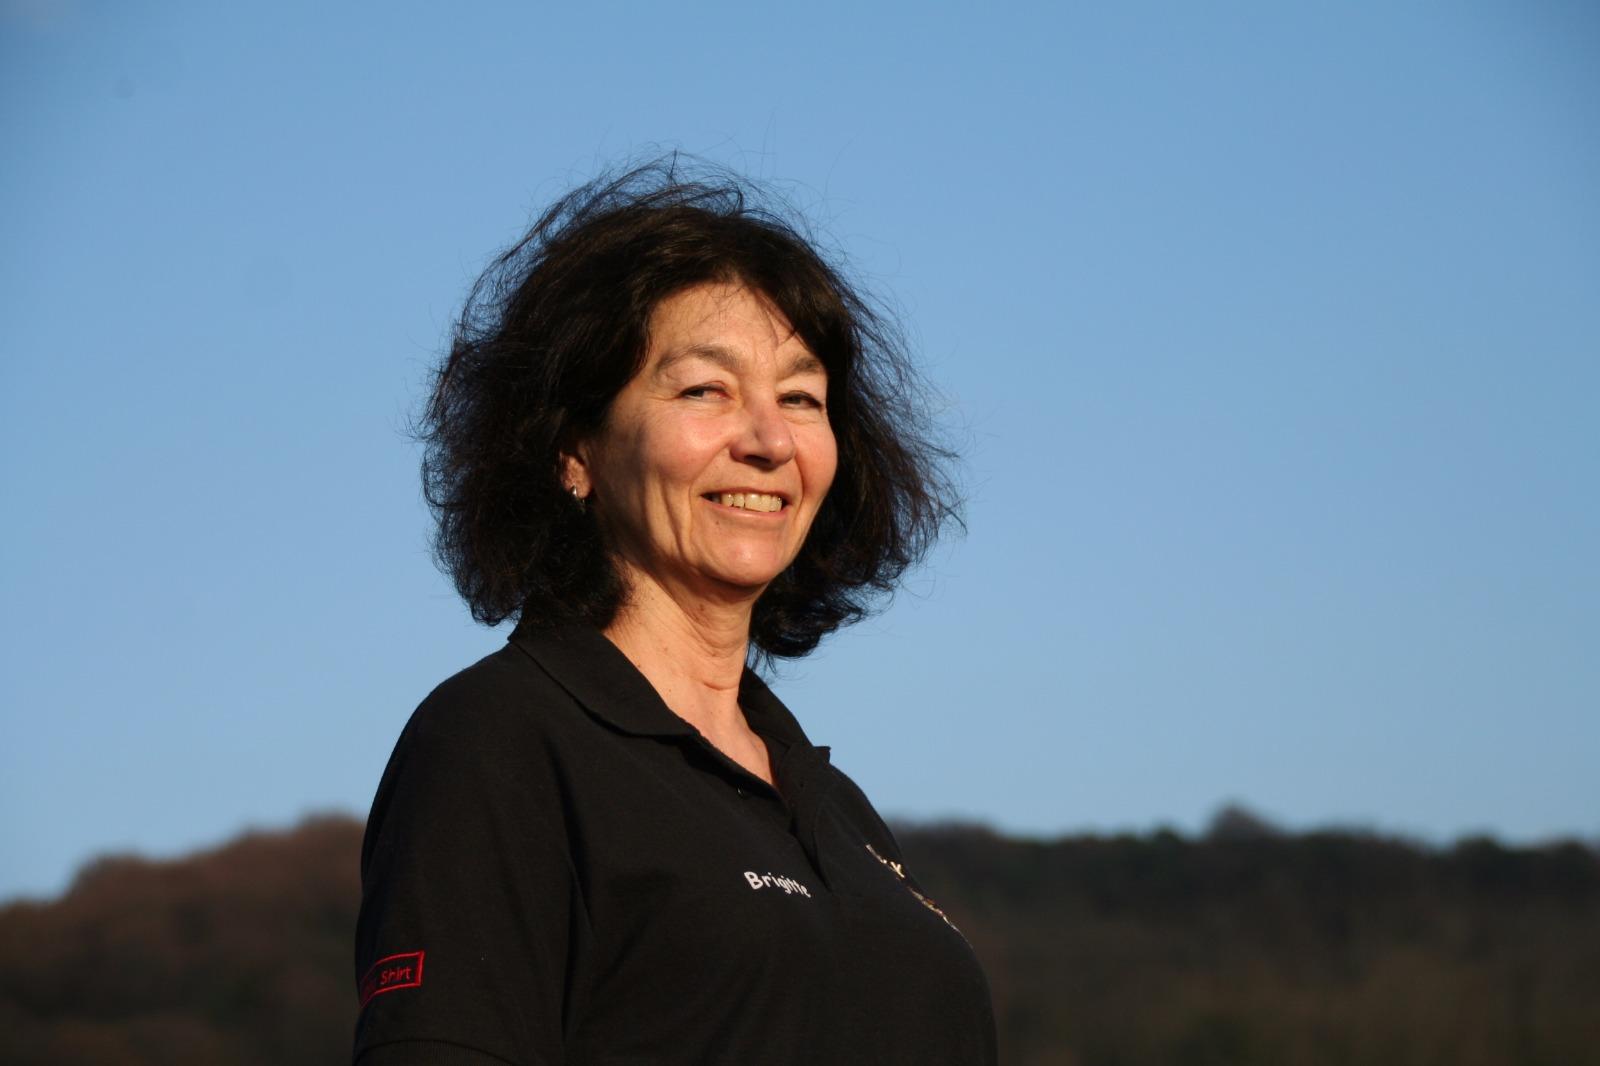 Lucky Liners Brigitte Wacker - Schriftführer-Stellvertreterin